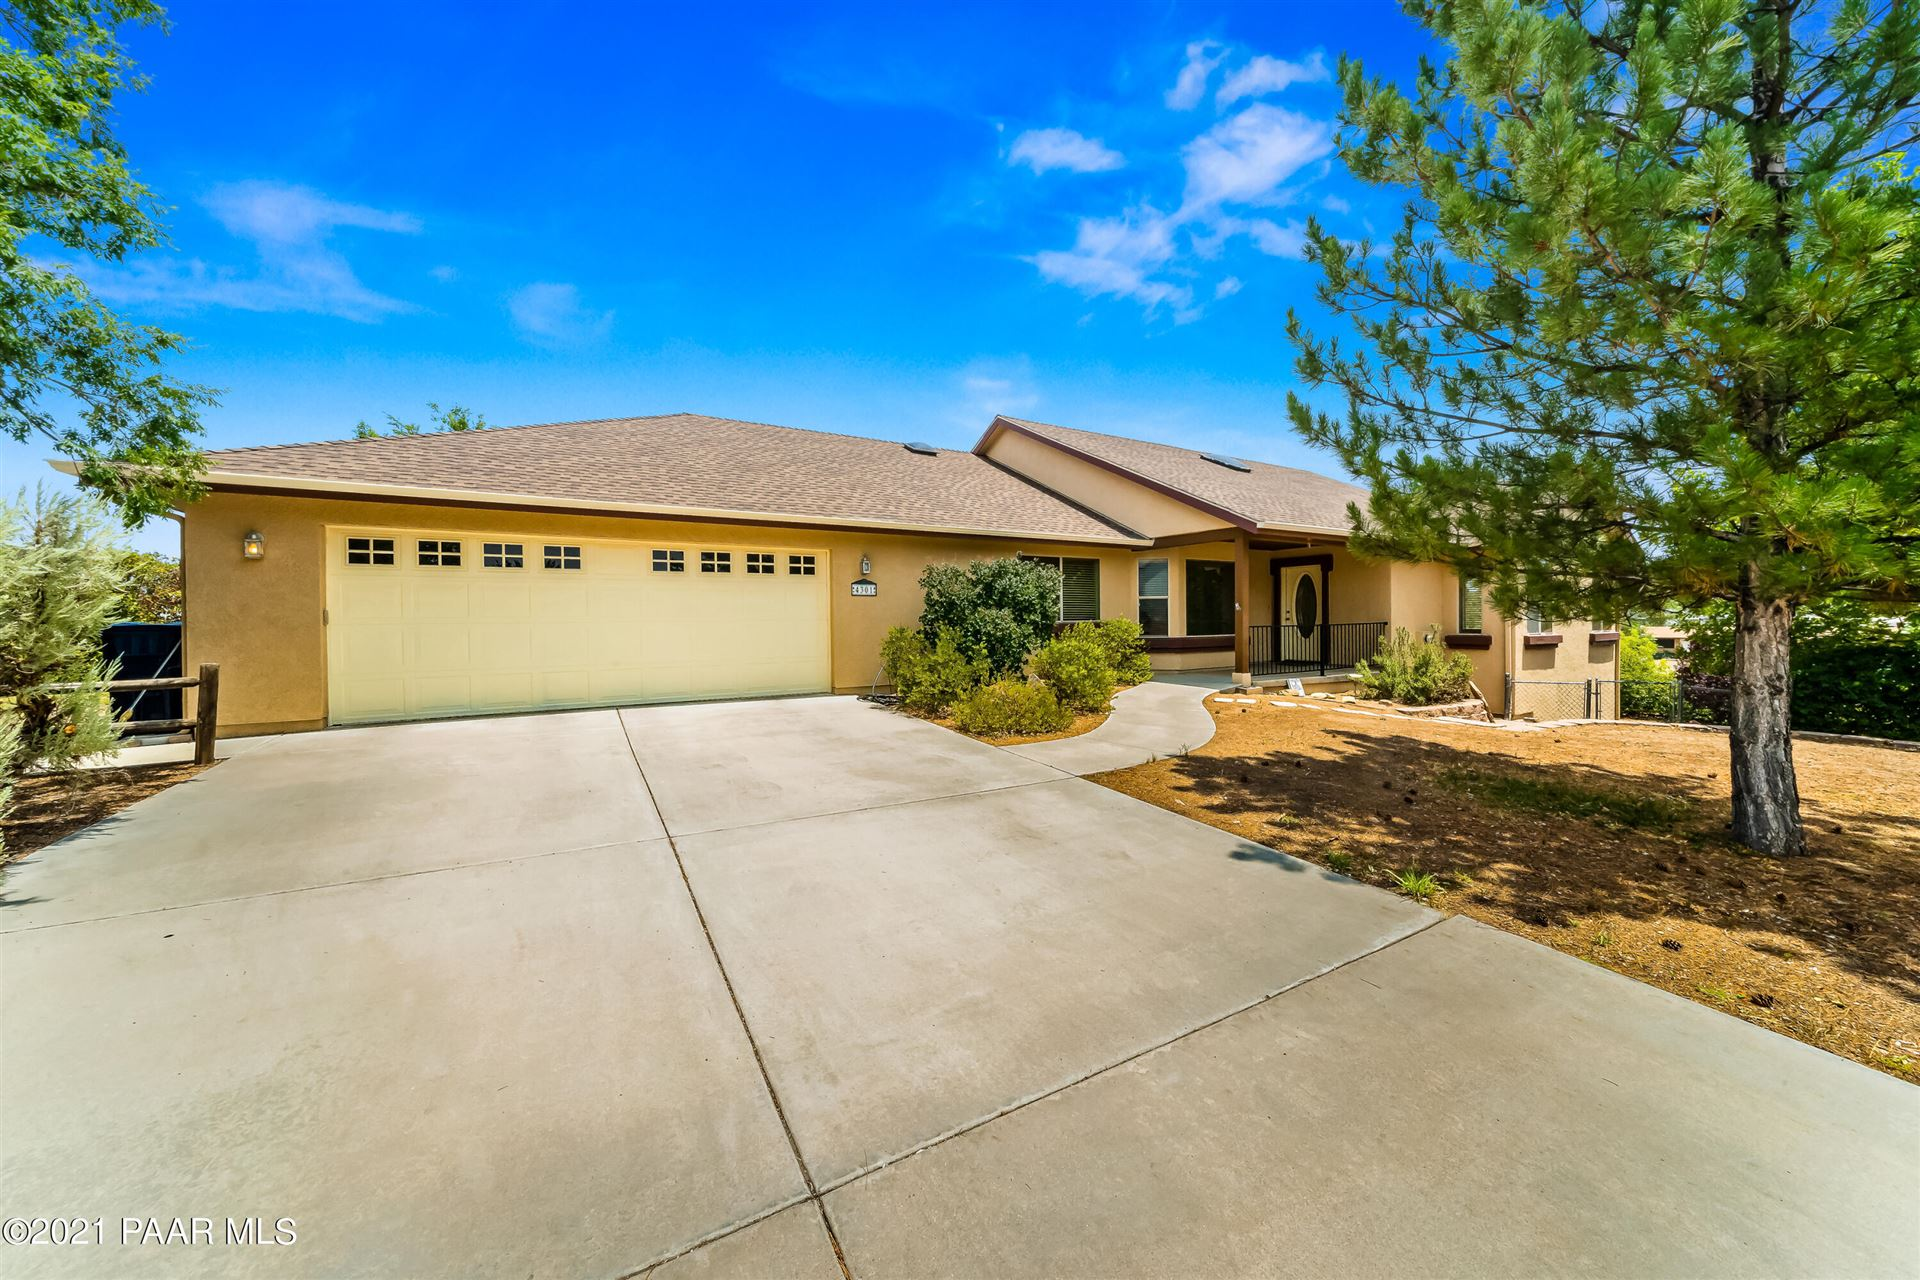 Photo of 4301 N Capri Circle #Lot: 8876, Prescott Valley, AZ 86314 (MLS # 1040429)